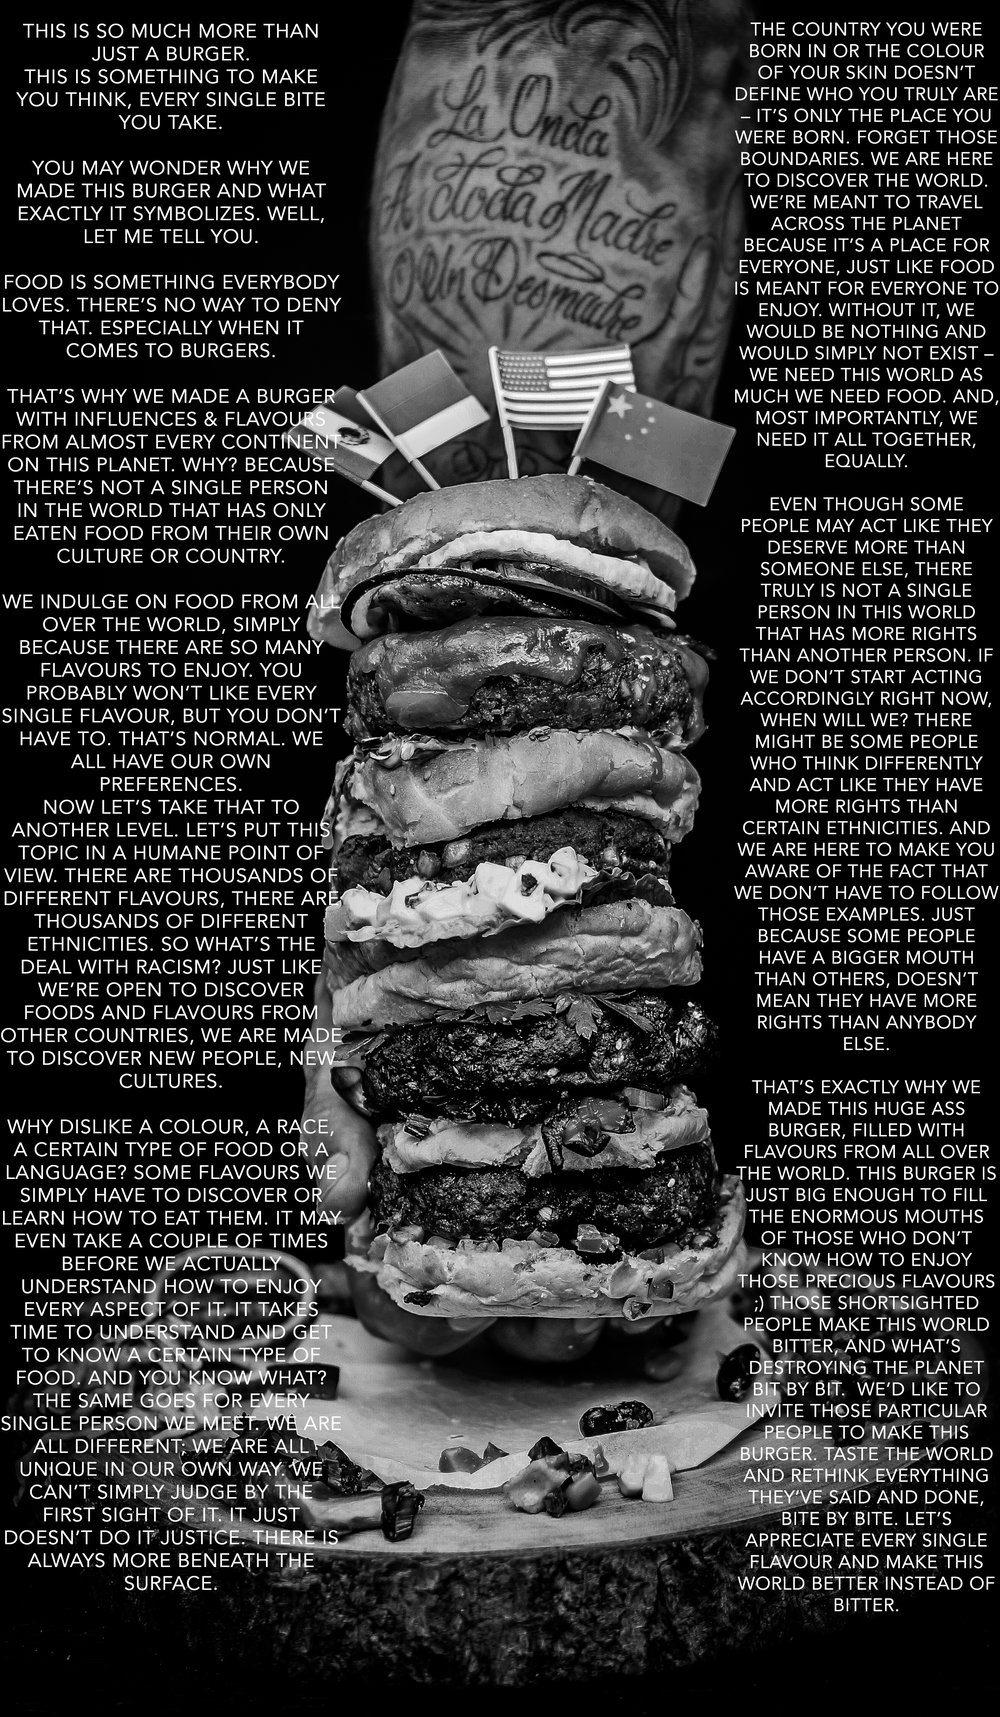 Tekst burger.jpg